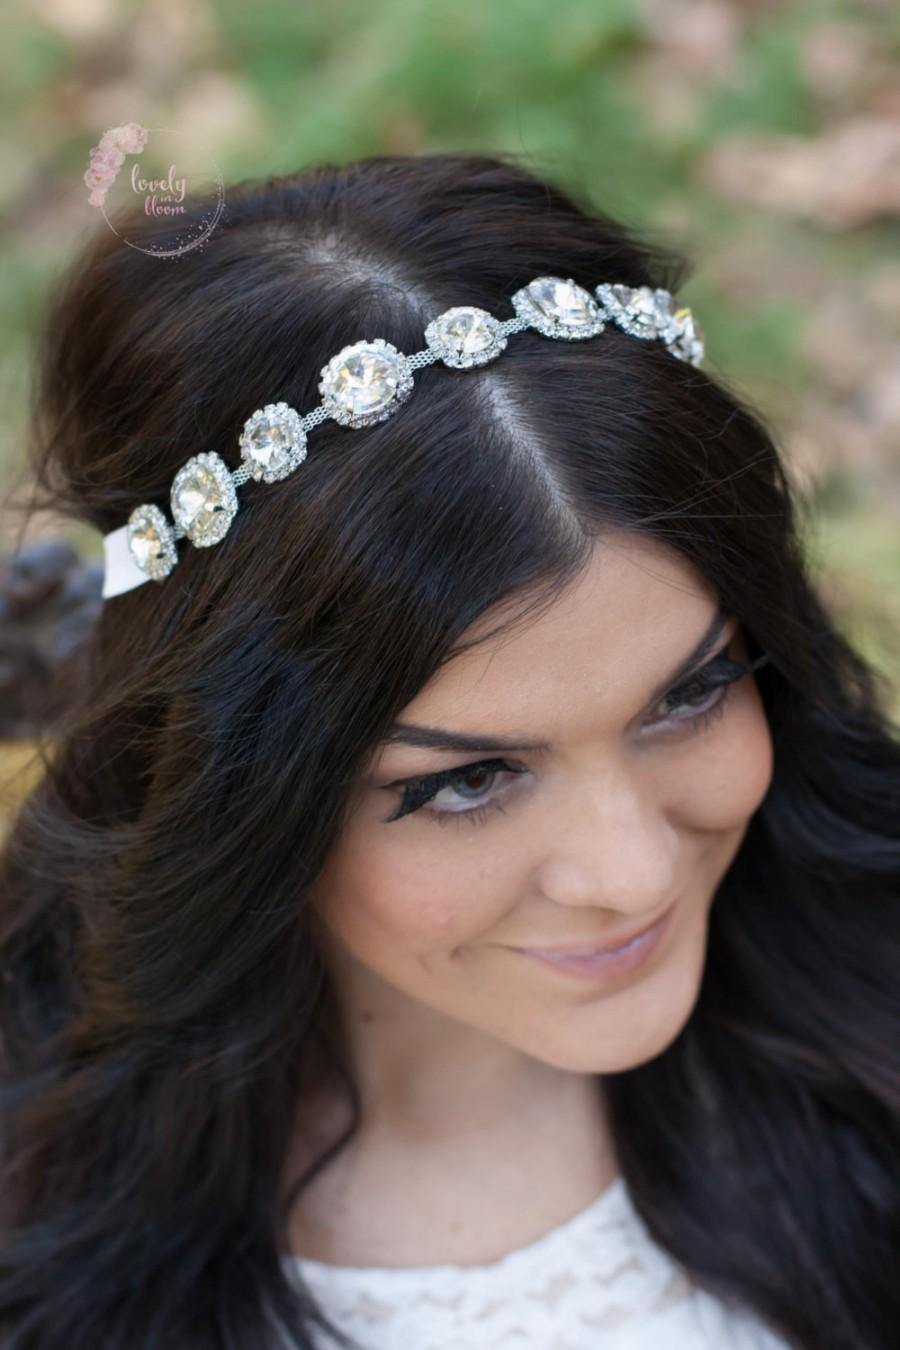 bride headpiece, wedding headband, jeweled headpiece, jeweled